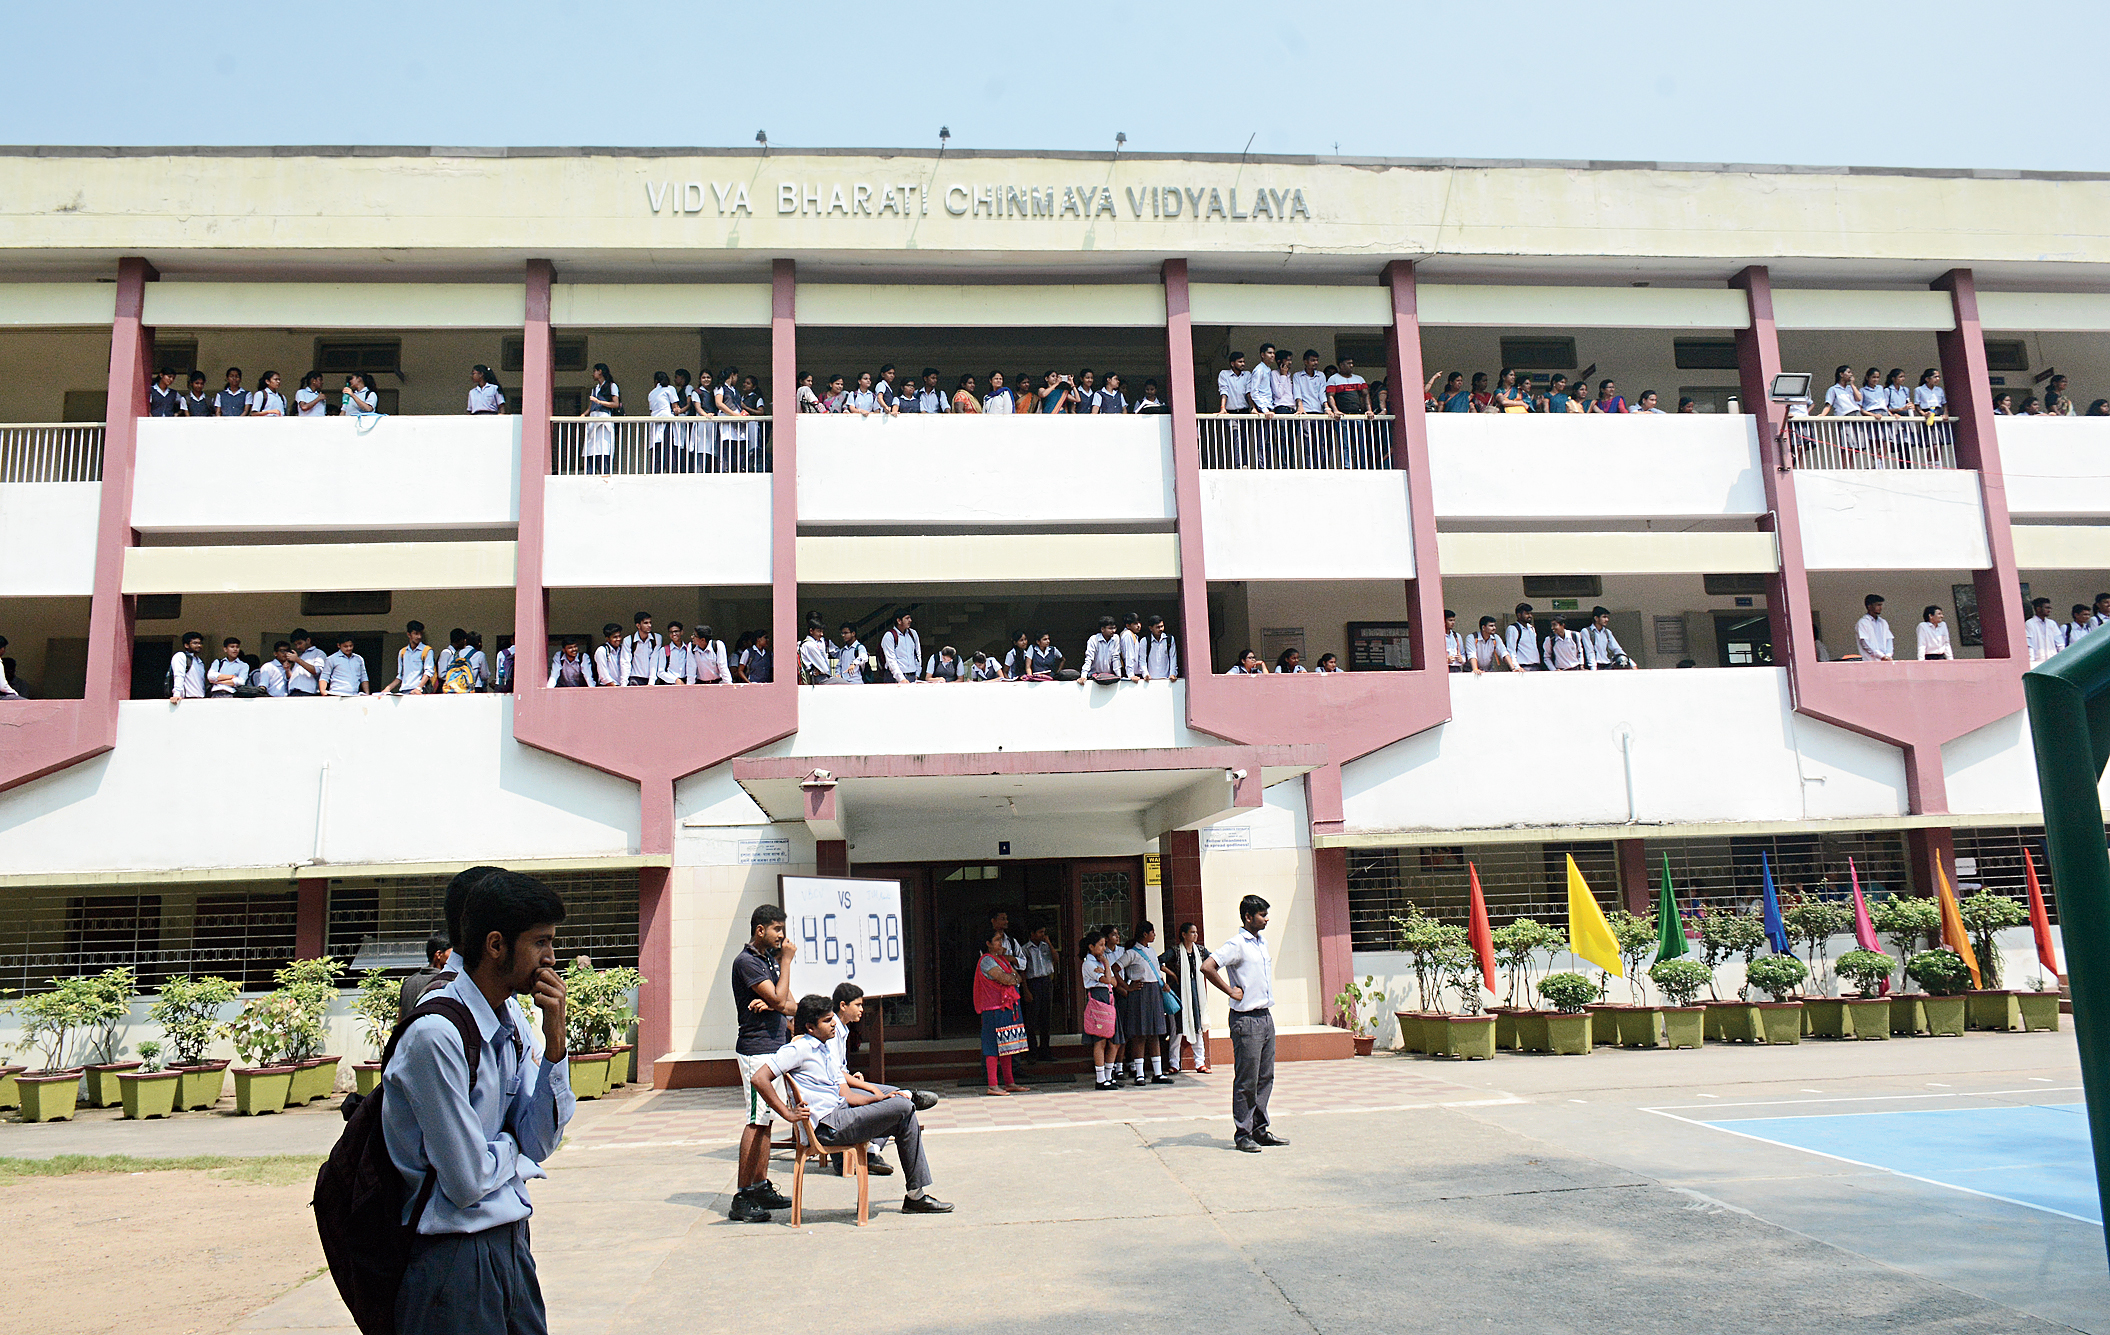 Vidya Bharati Chinmaya Vidyalaya, one of the CBSE evaluation centres in Jamshedpur.